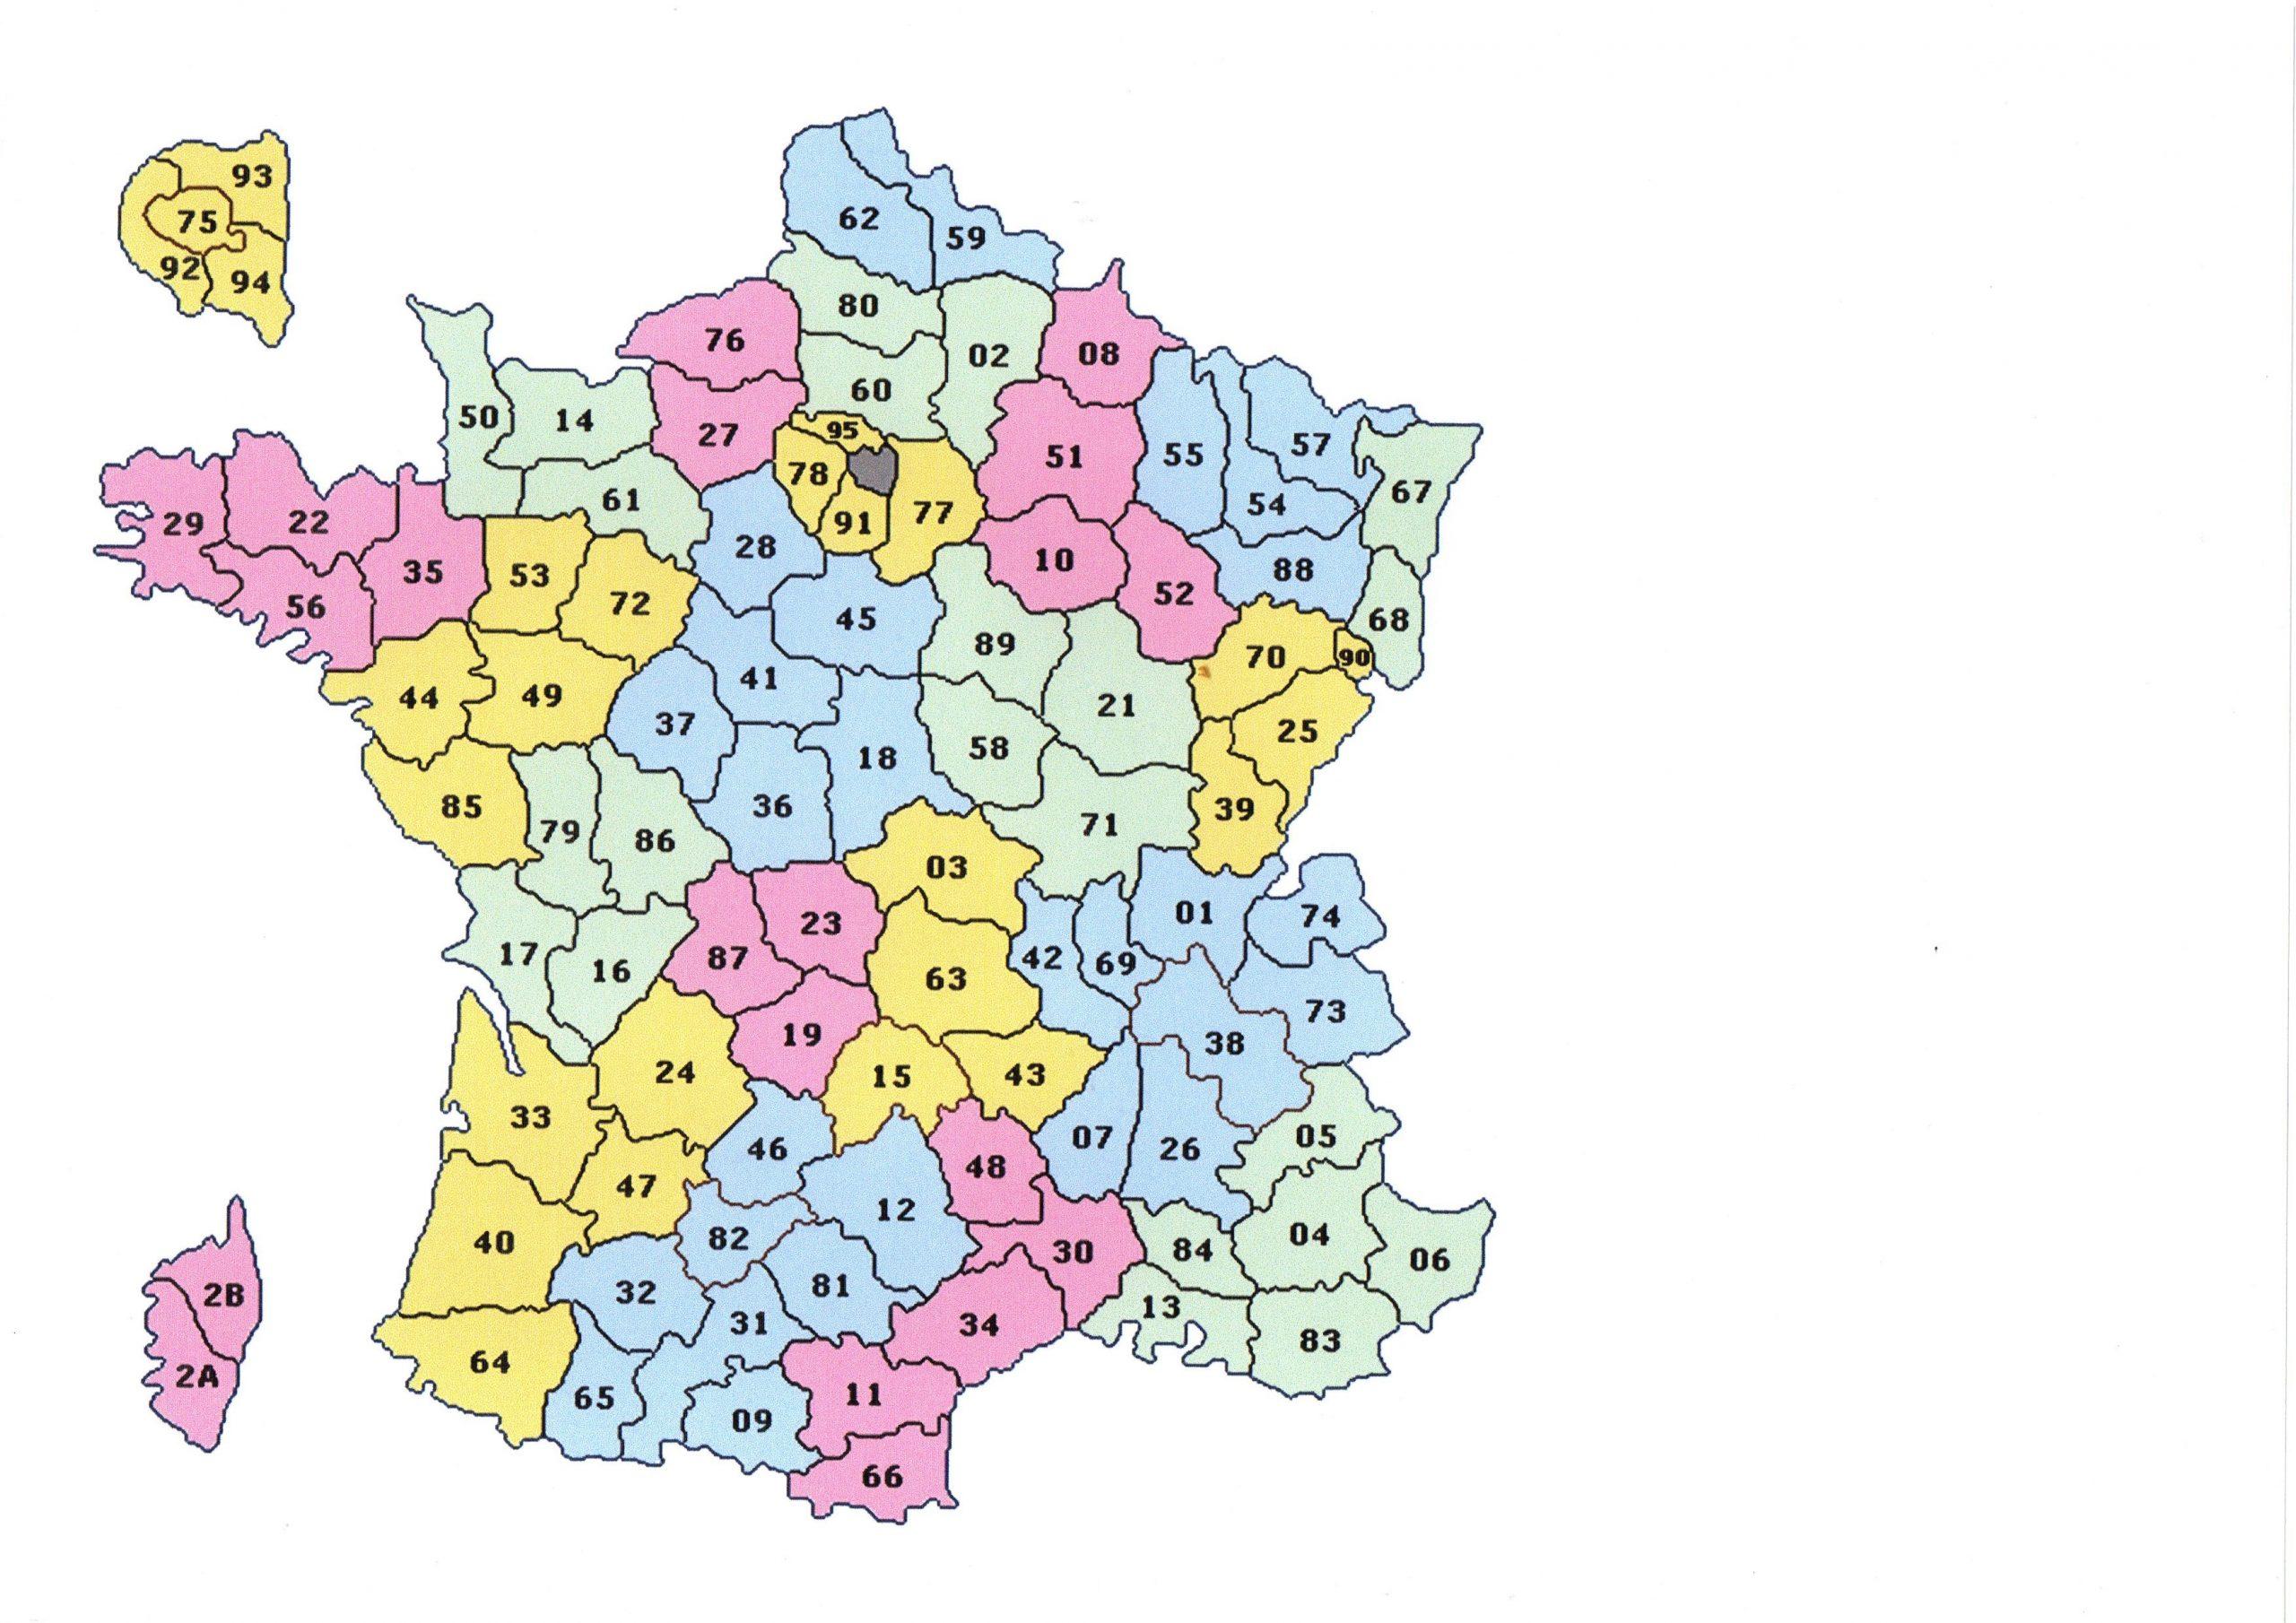 Jeux Geographie Carte De France encequiconcerne Jeu Geographie France